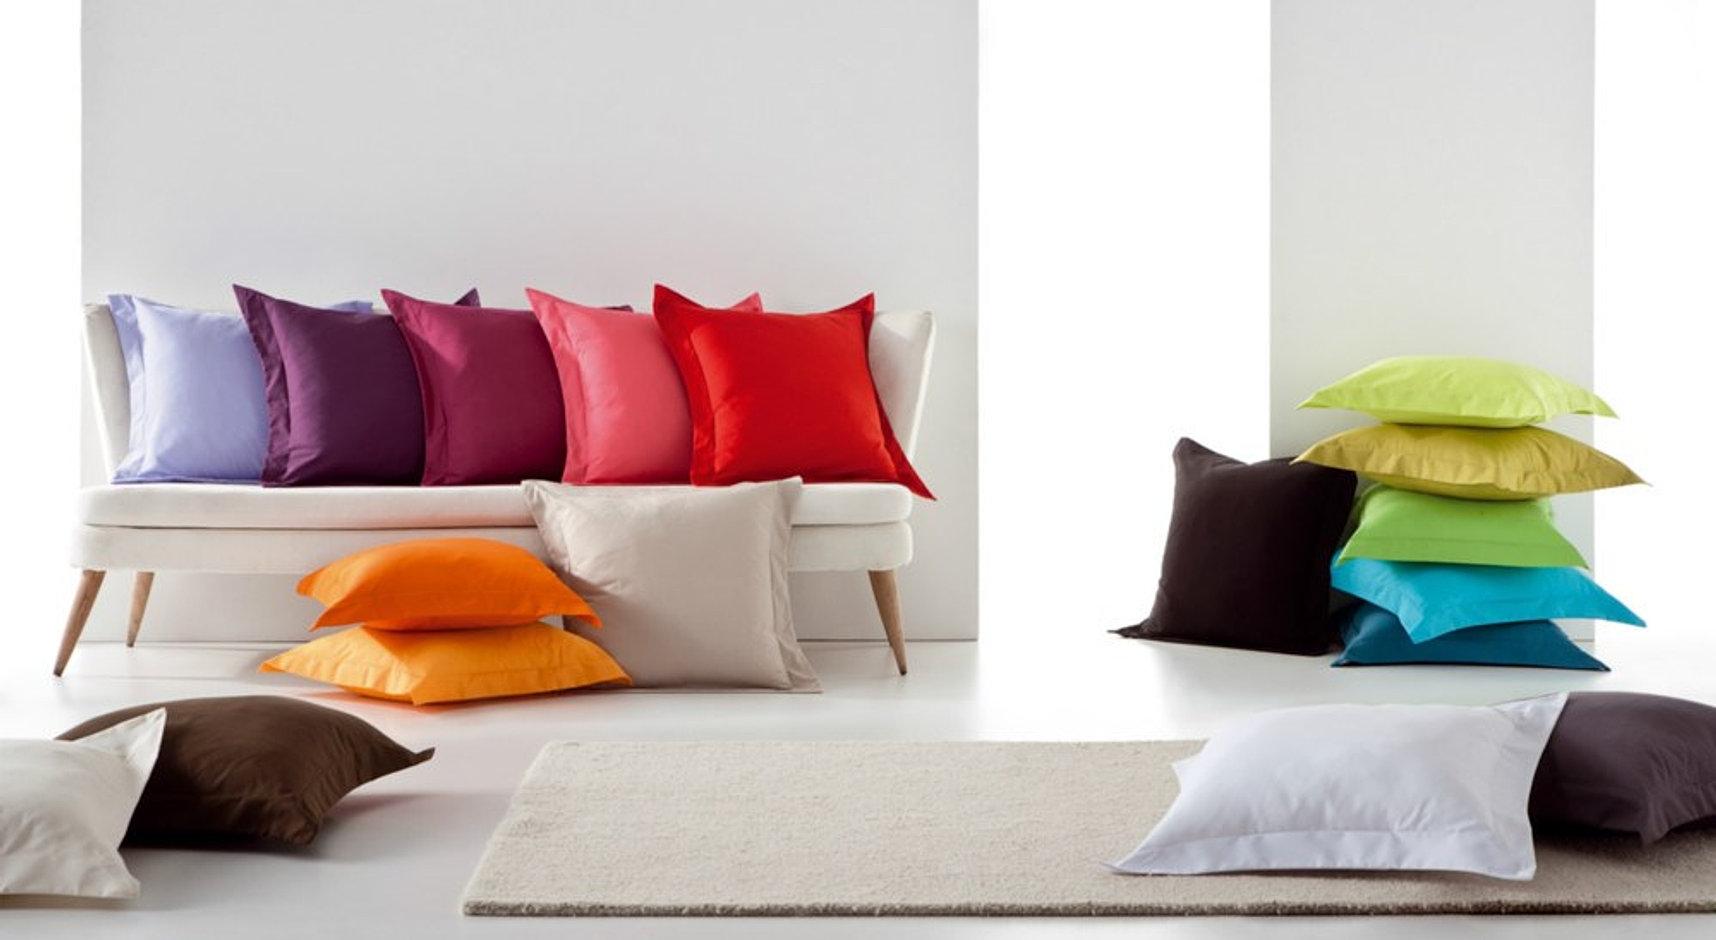 Sofass sevilla auxiliares y pufs en sevilla for Natuzzi sevilla